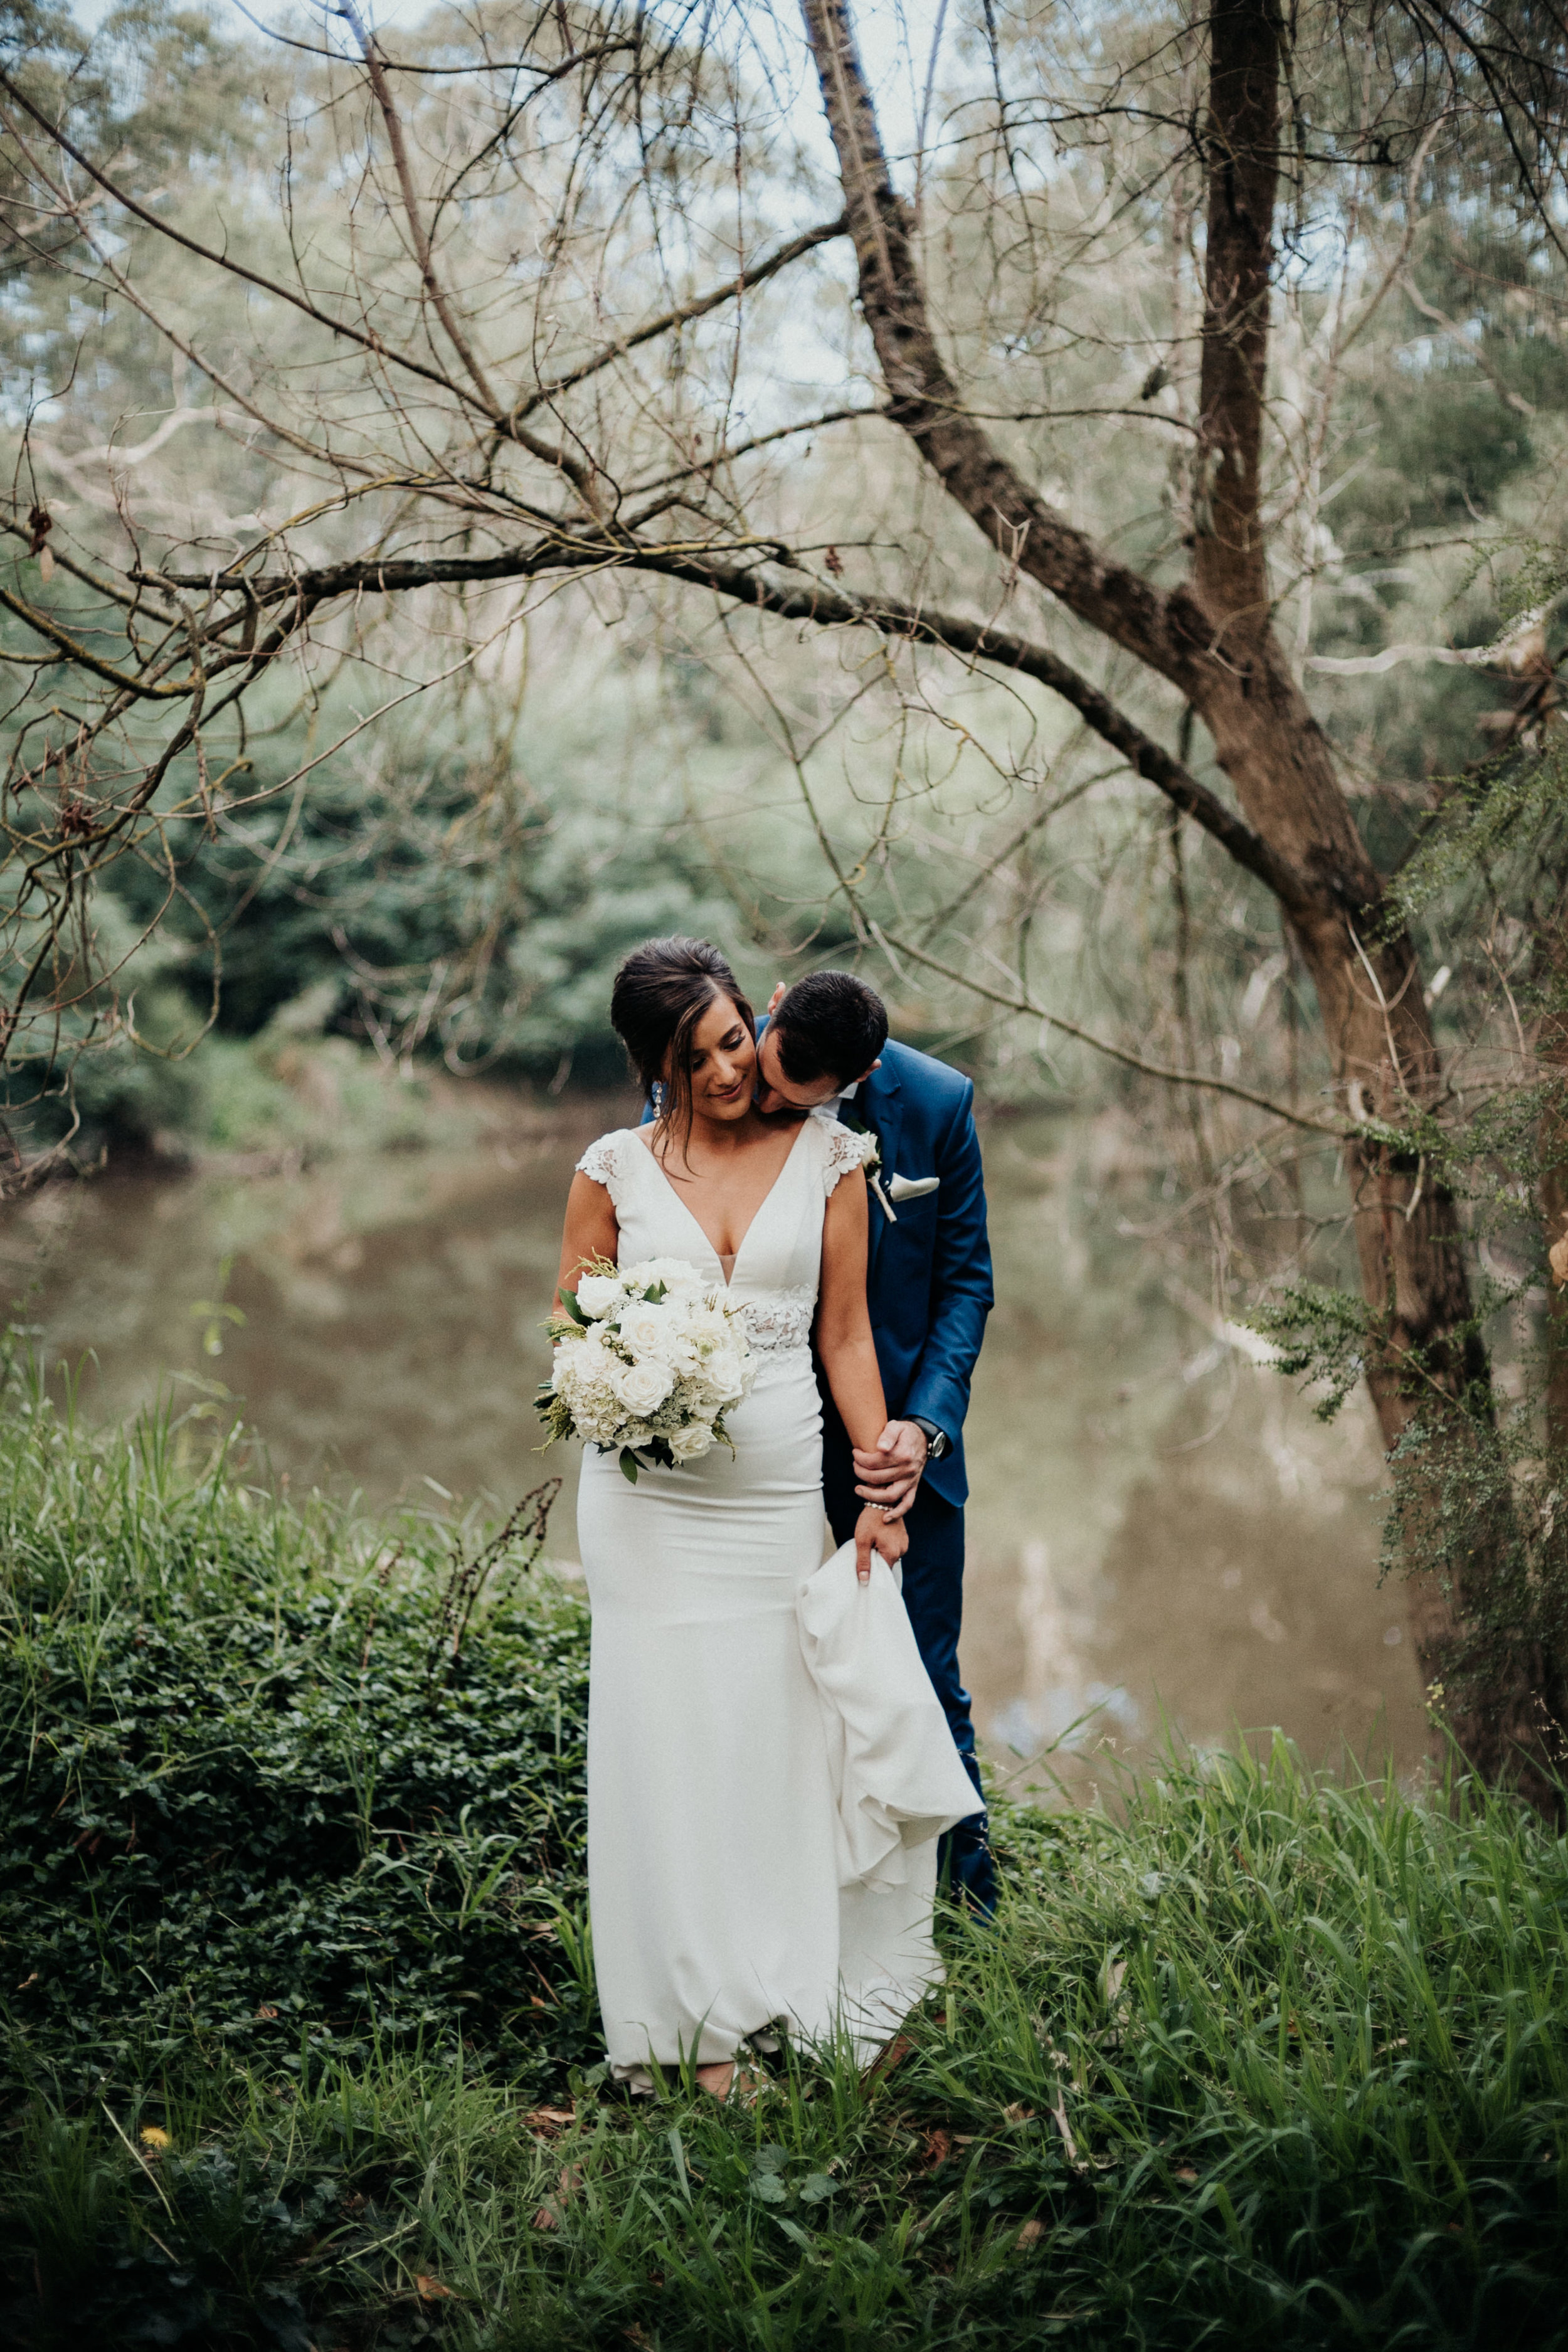 Aleksandra-Mladen-Wedding-Andy-409.jpg